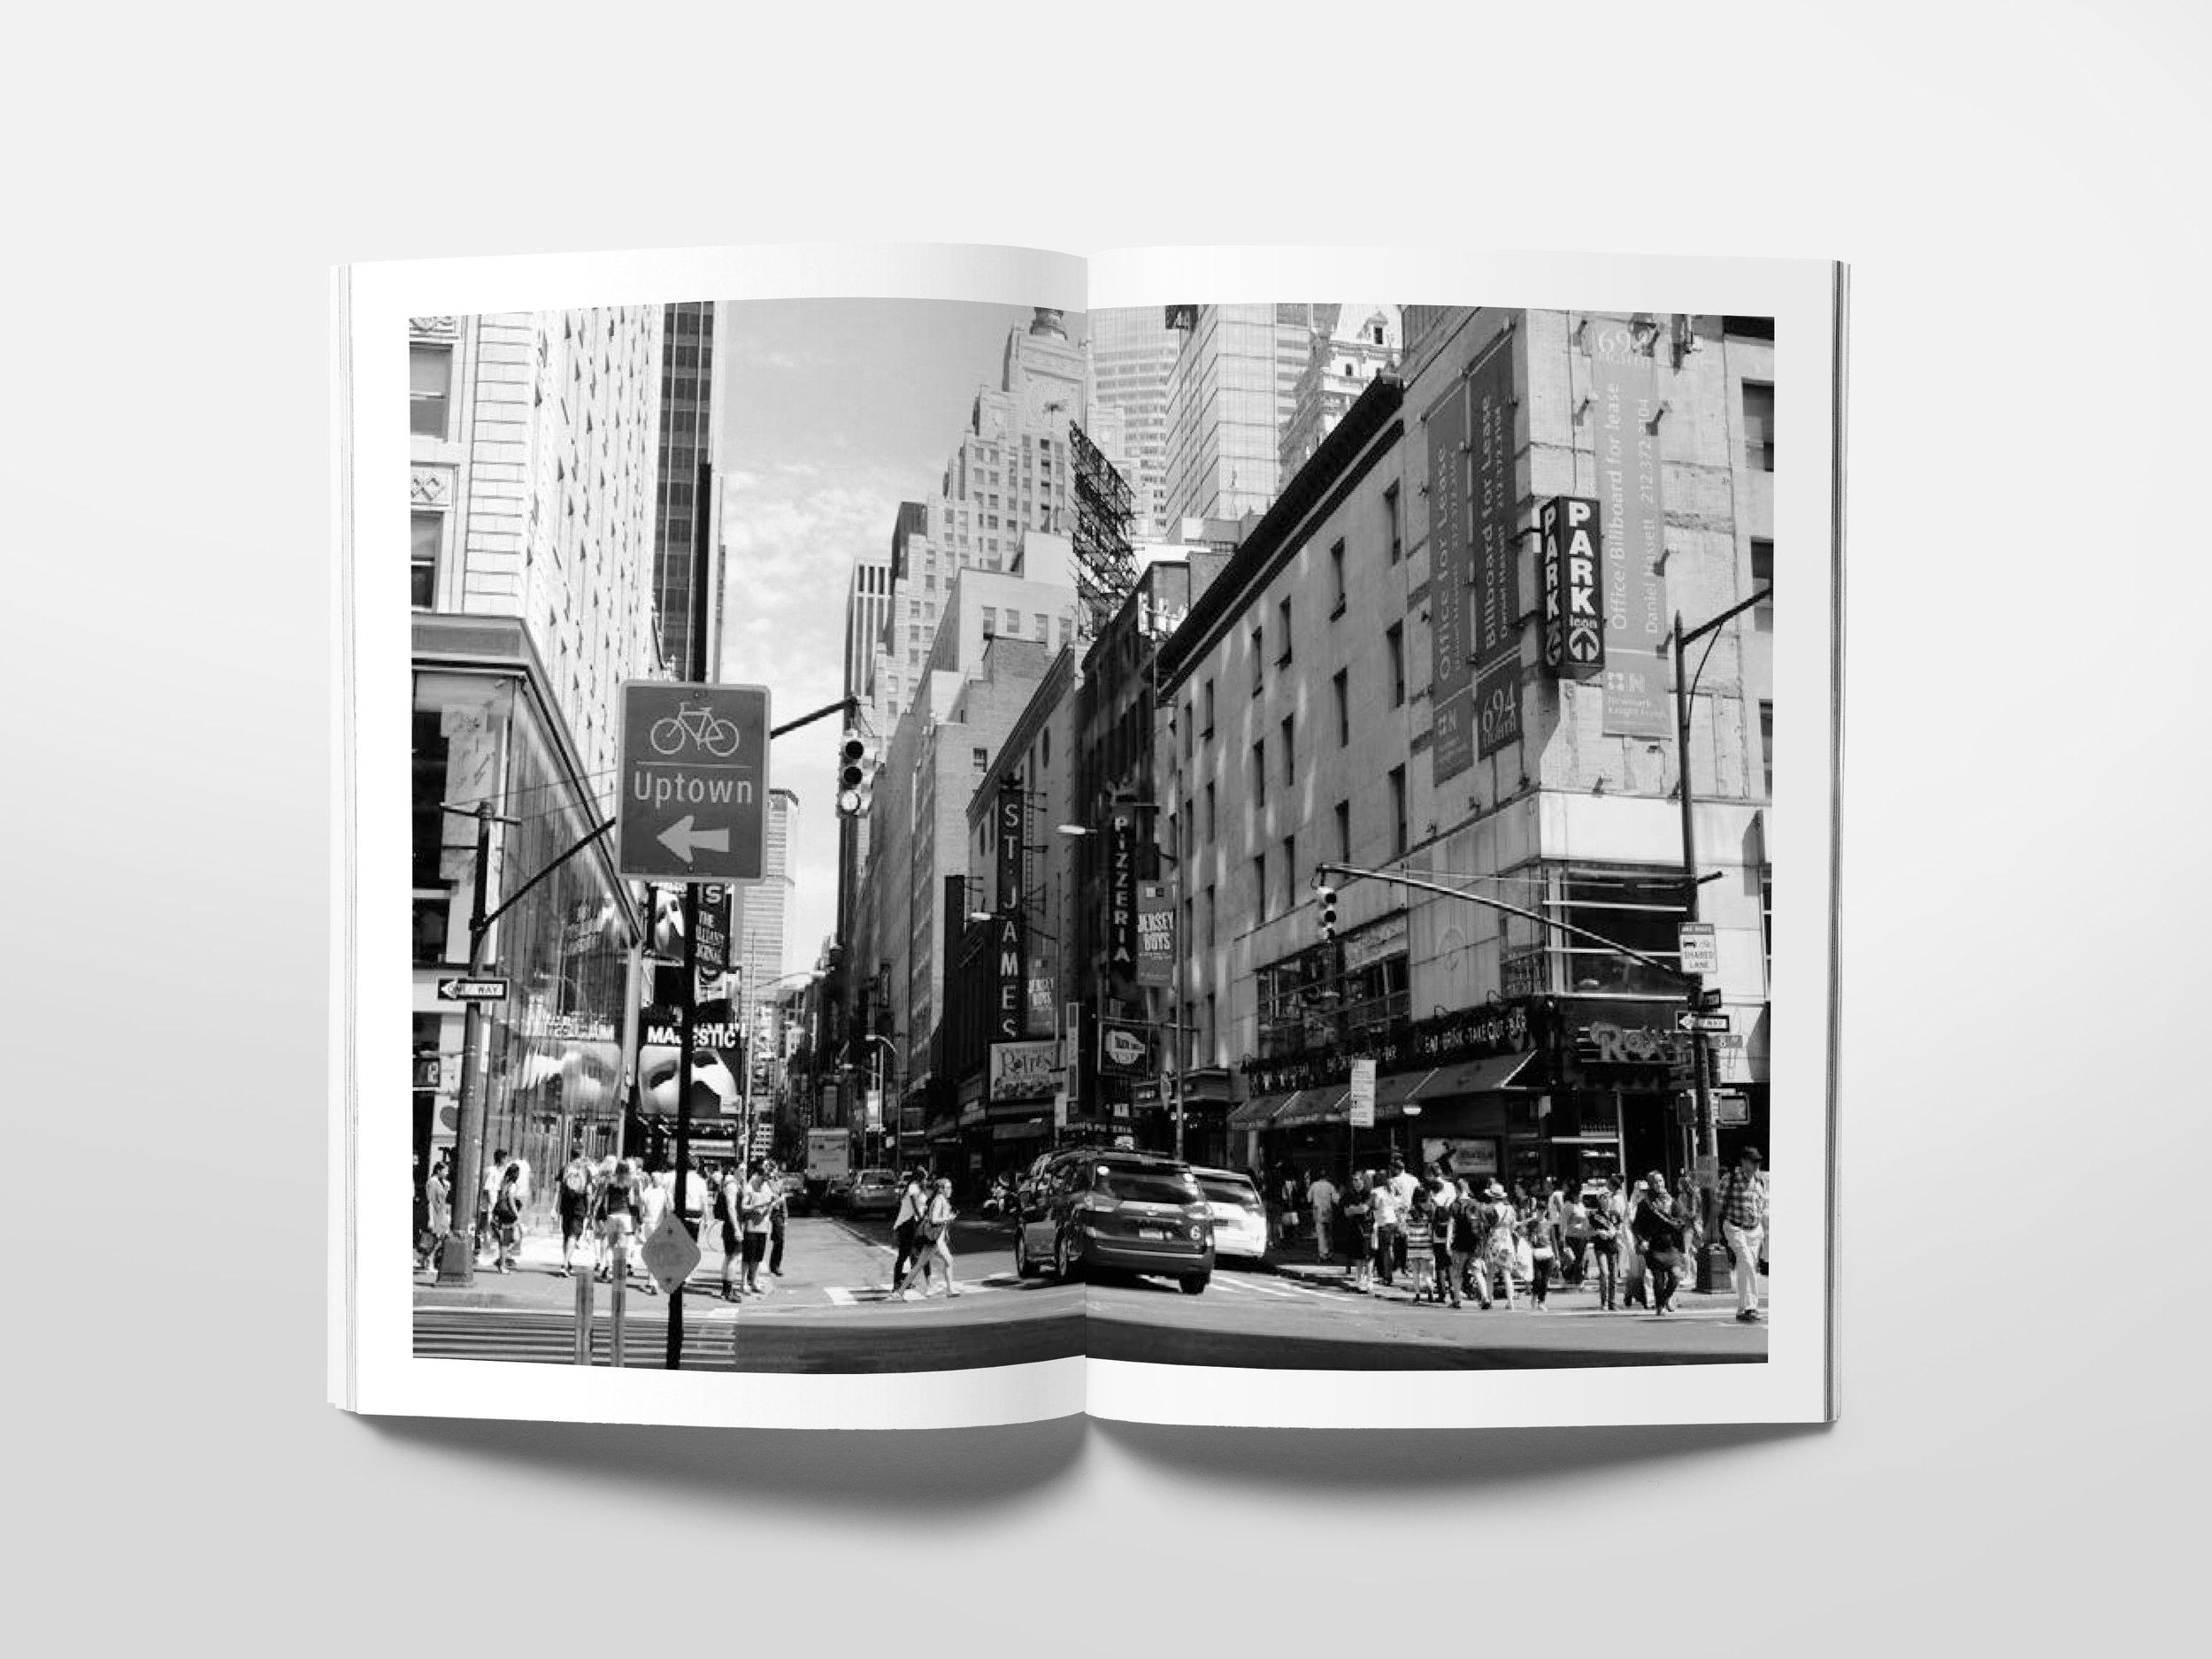 Broadway_St.James_Optimized3.jpg